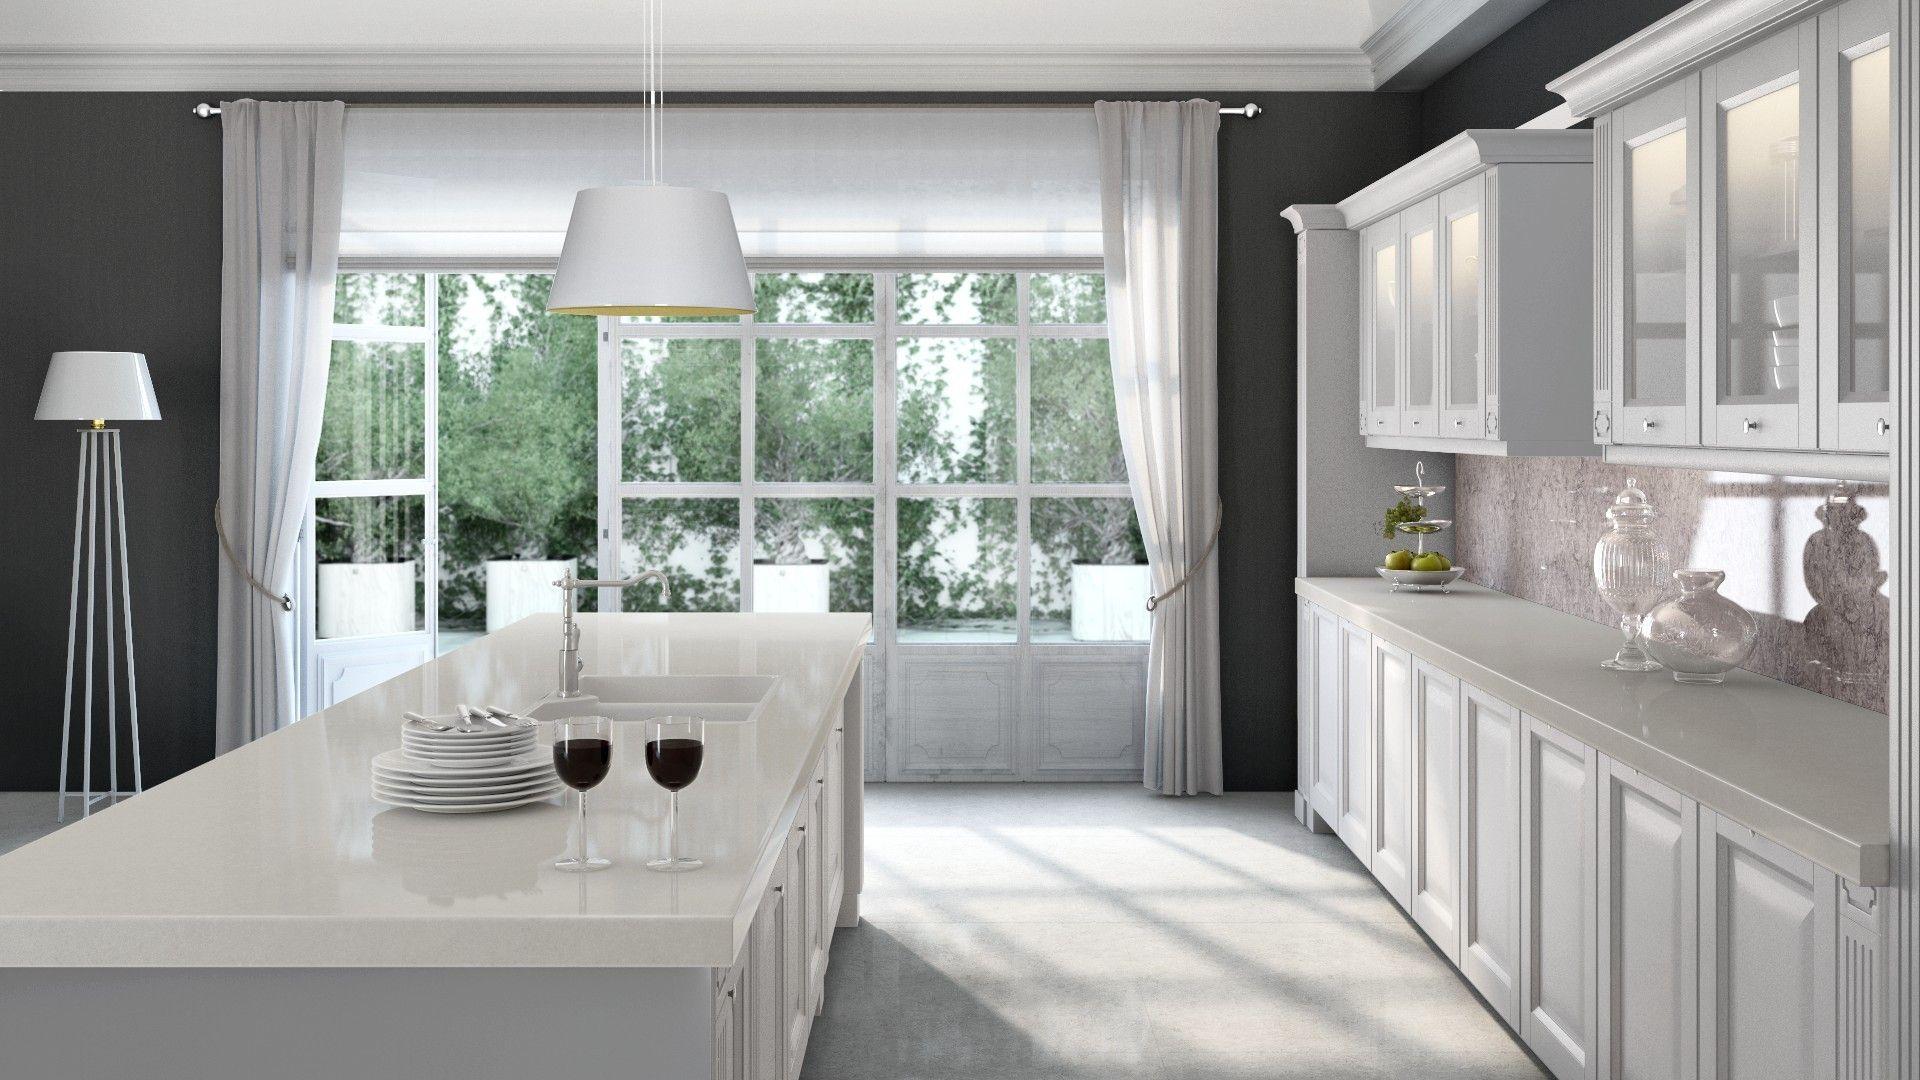 CaesarStone Misty Carrara Virtual kitchen designer